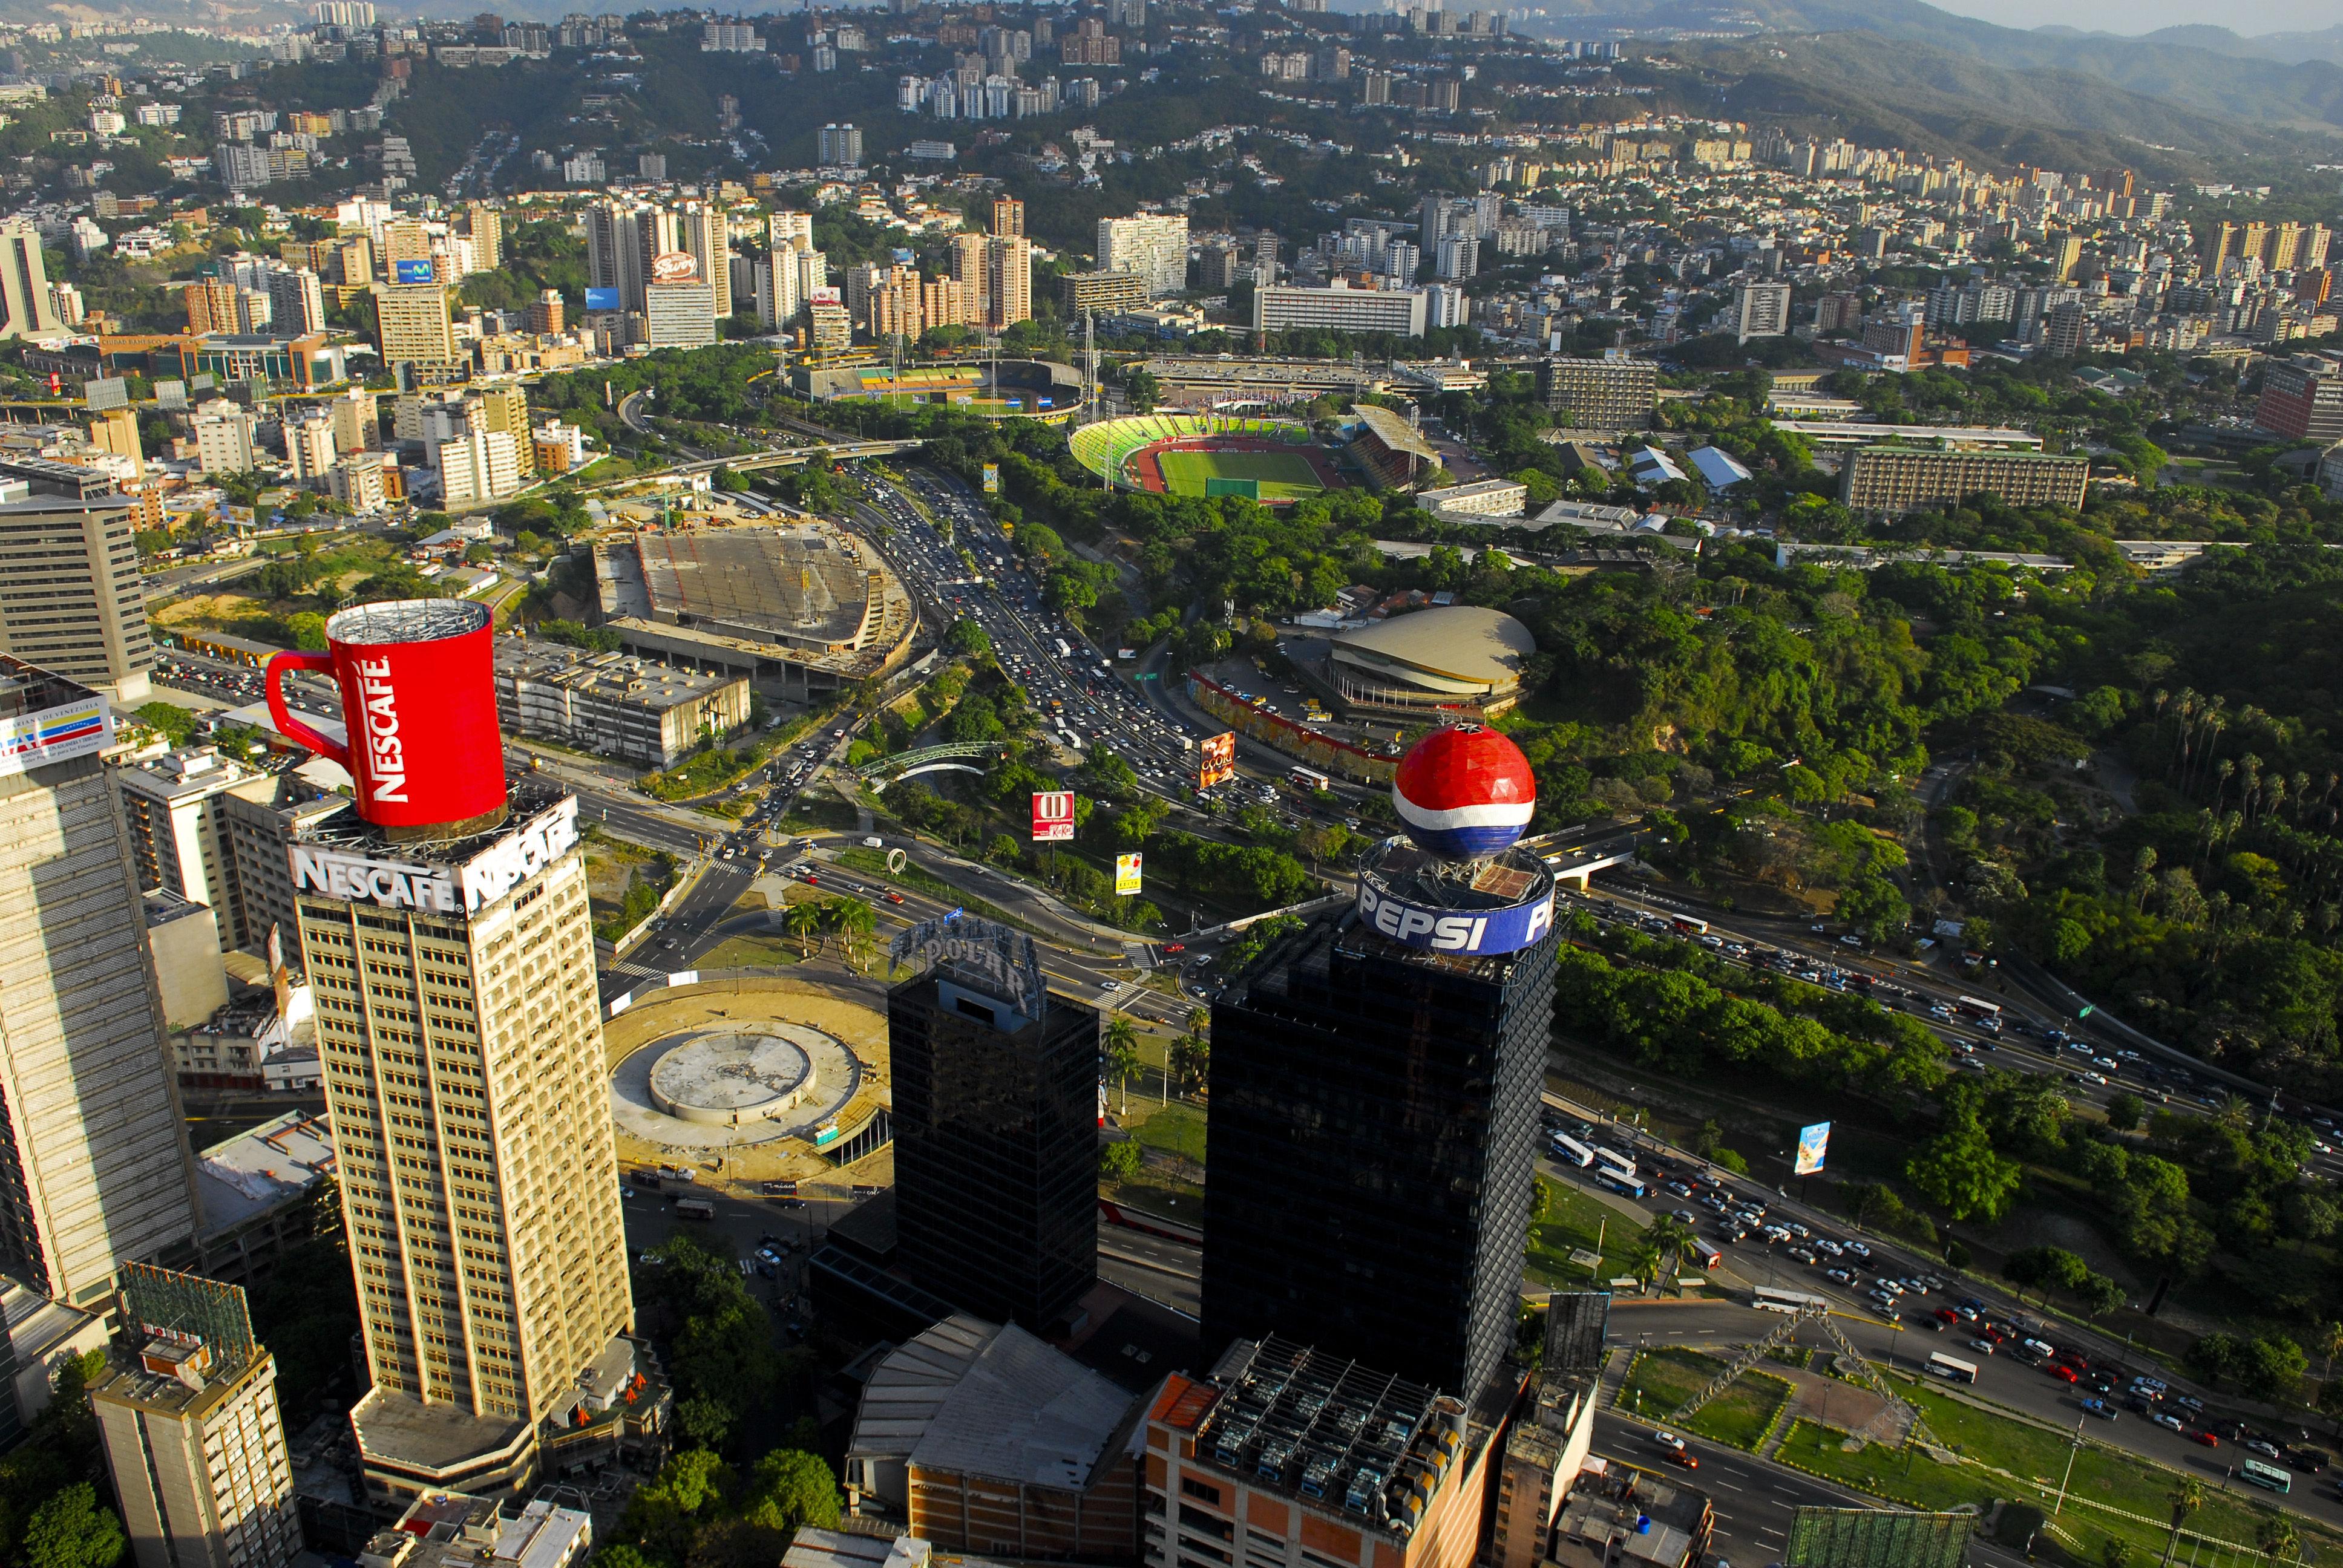 ¿Cuál es la capital de Venezuela?